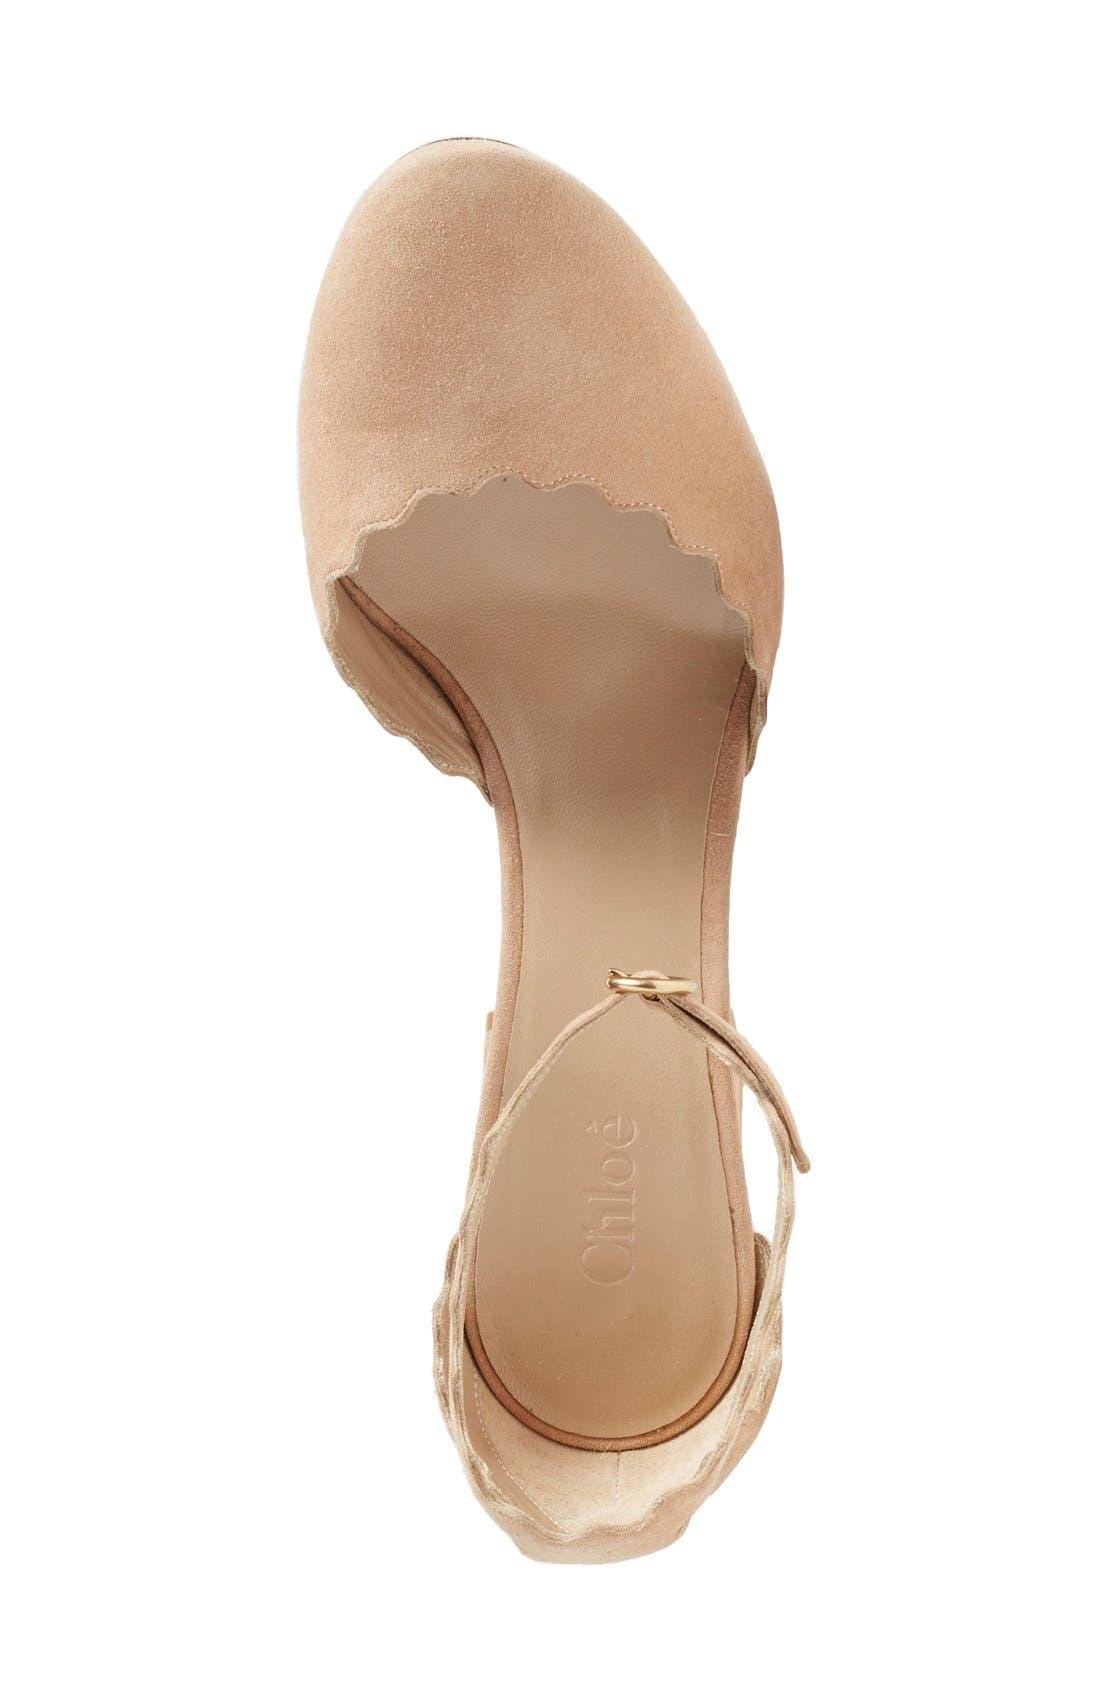 Alternate Image 3  - Chloé Scalloped Ankle Strap d'Orsay Pump (Women)